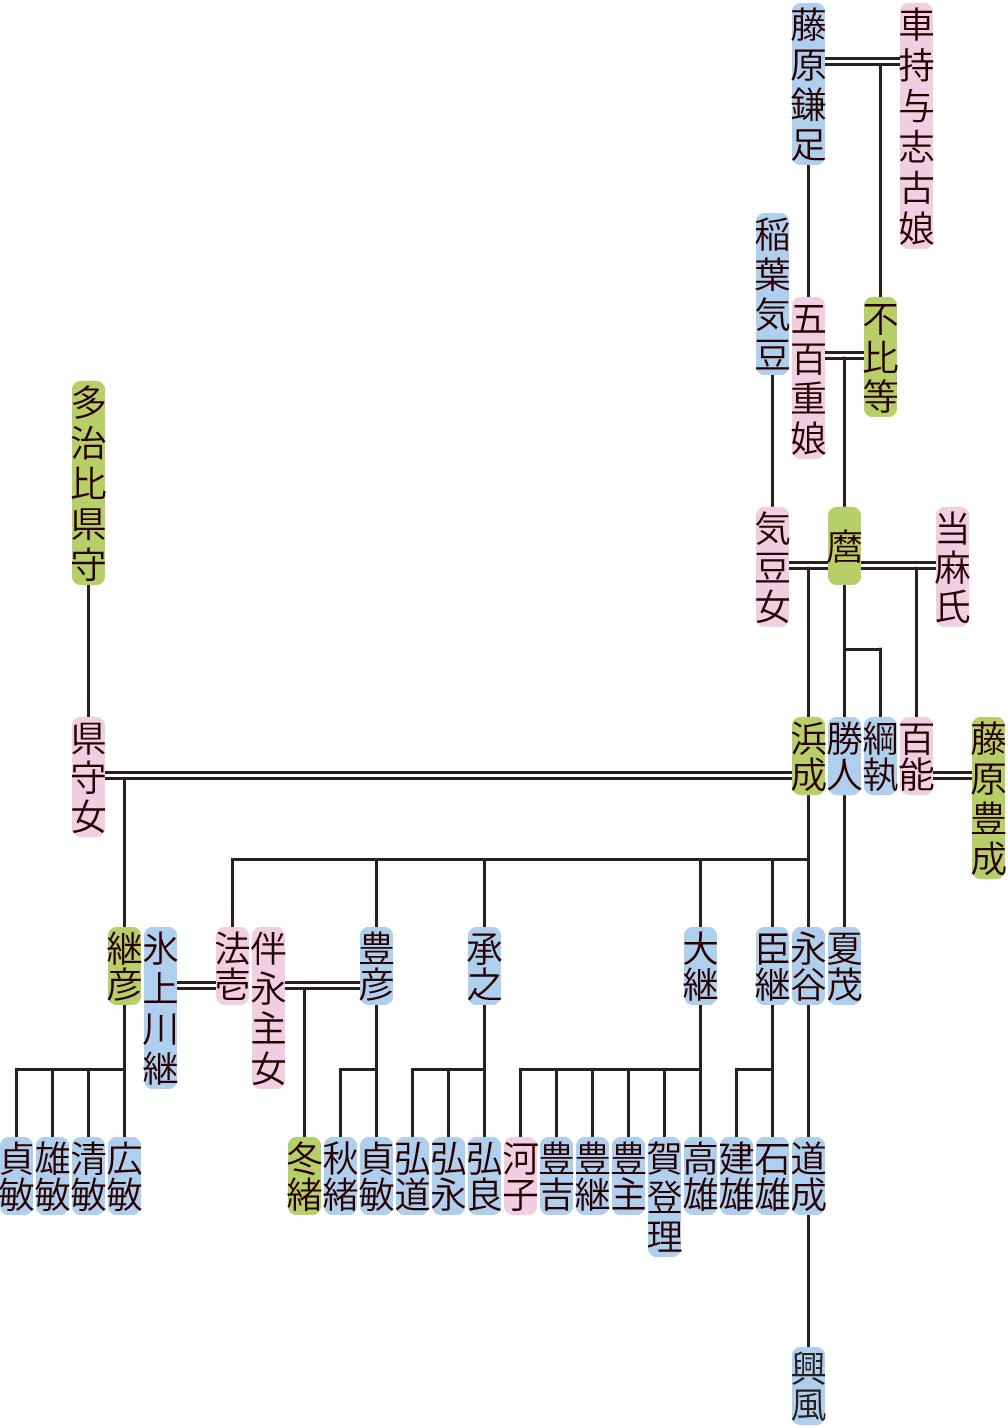 藤原麿・浜成の系図